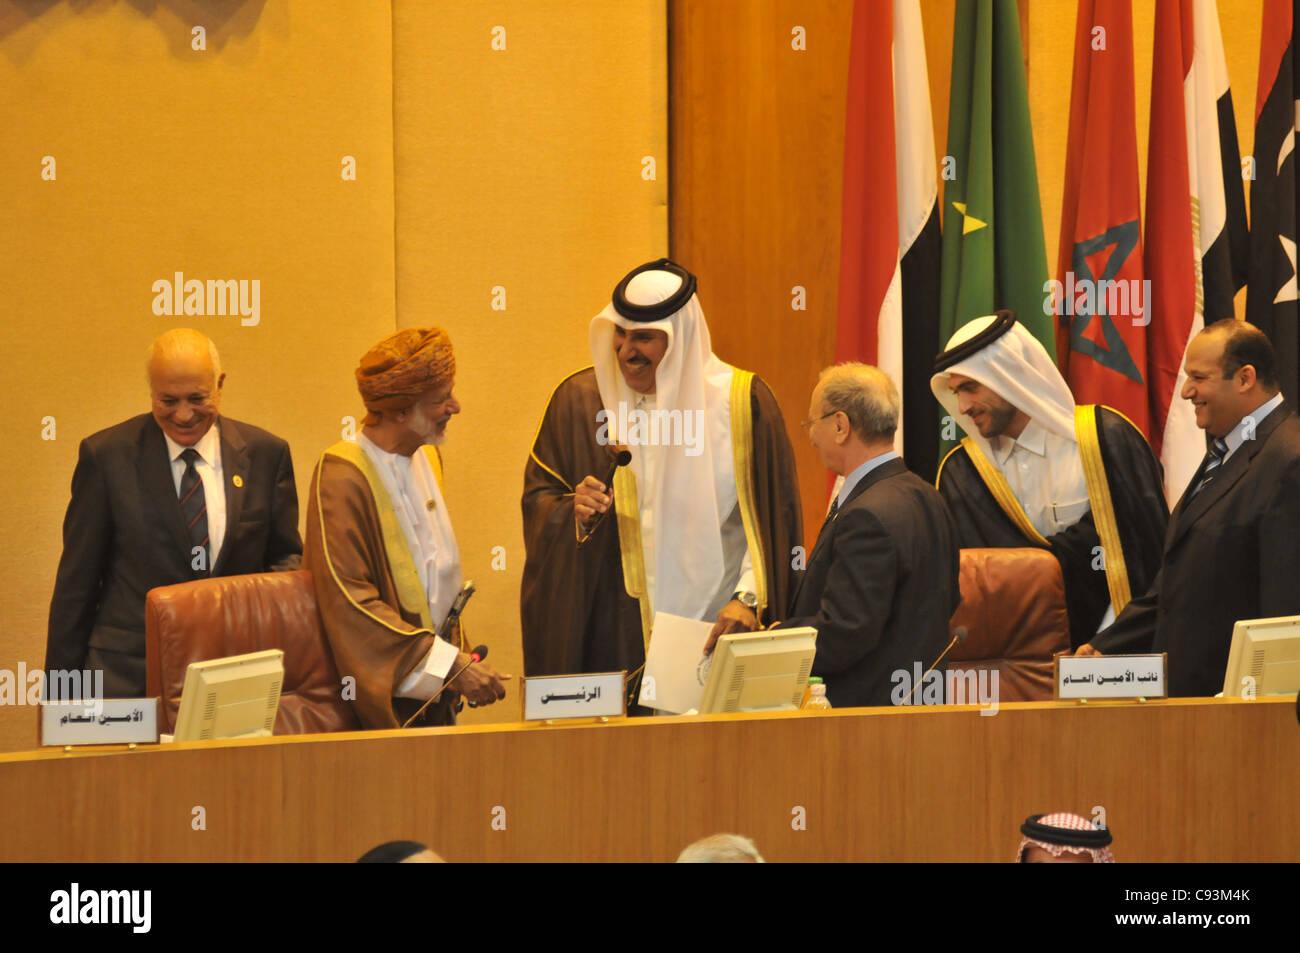 Qatari Prime Minister Foreign Minister Hamad Bin Jassim Bin Jabr Al-Thani at the Arab League in Cairo hosting Turkish Stock Photo